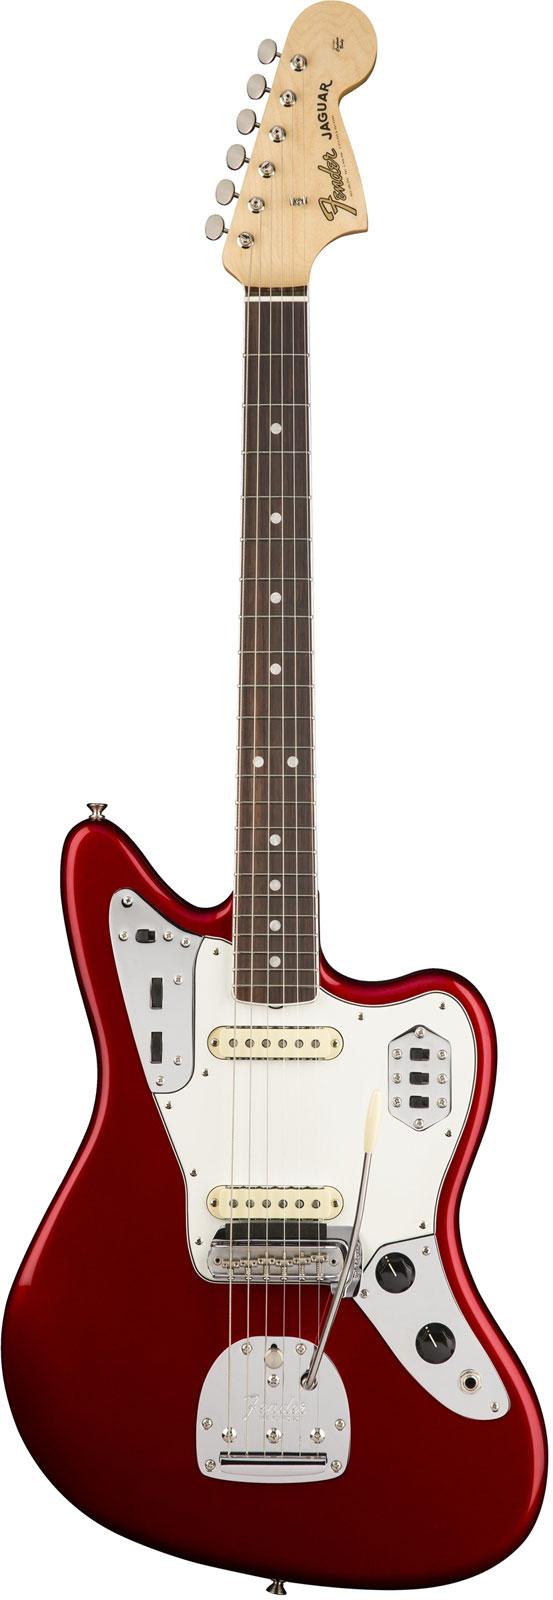 Fender American Original 60s Jaguar Rw Candy Apple Red